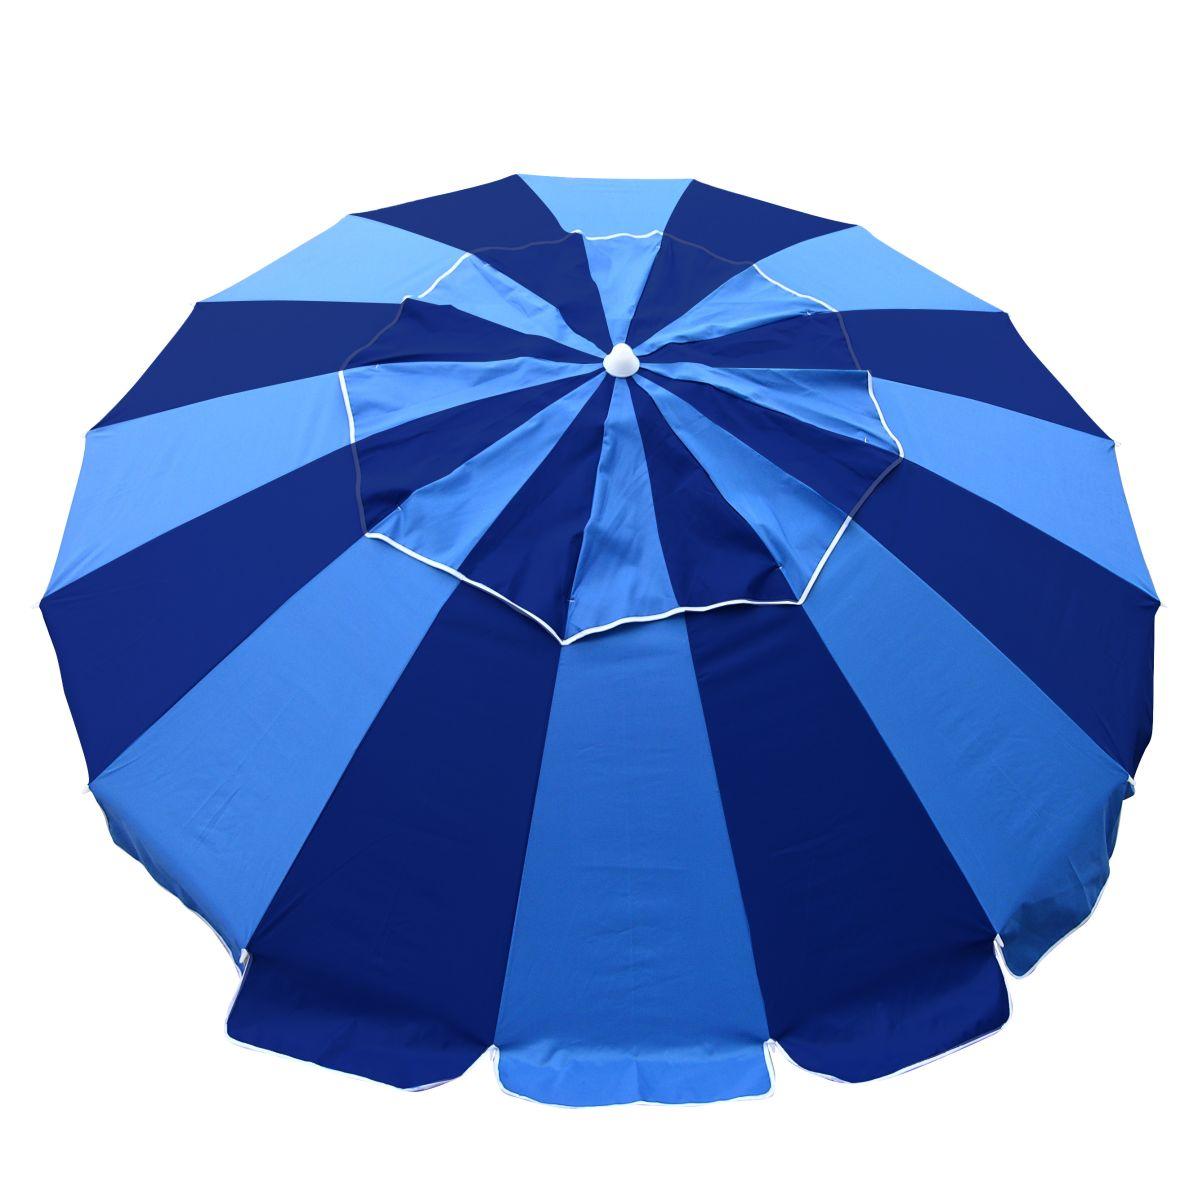 Carnivale Beach Umbrella Huge 8ft Canopy Navy Blue Royal Blue